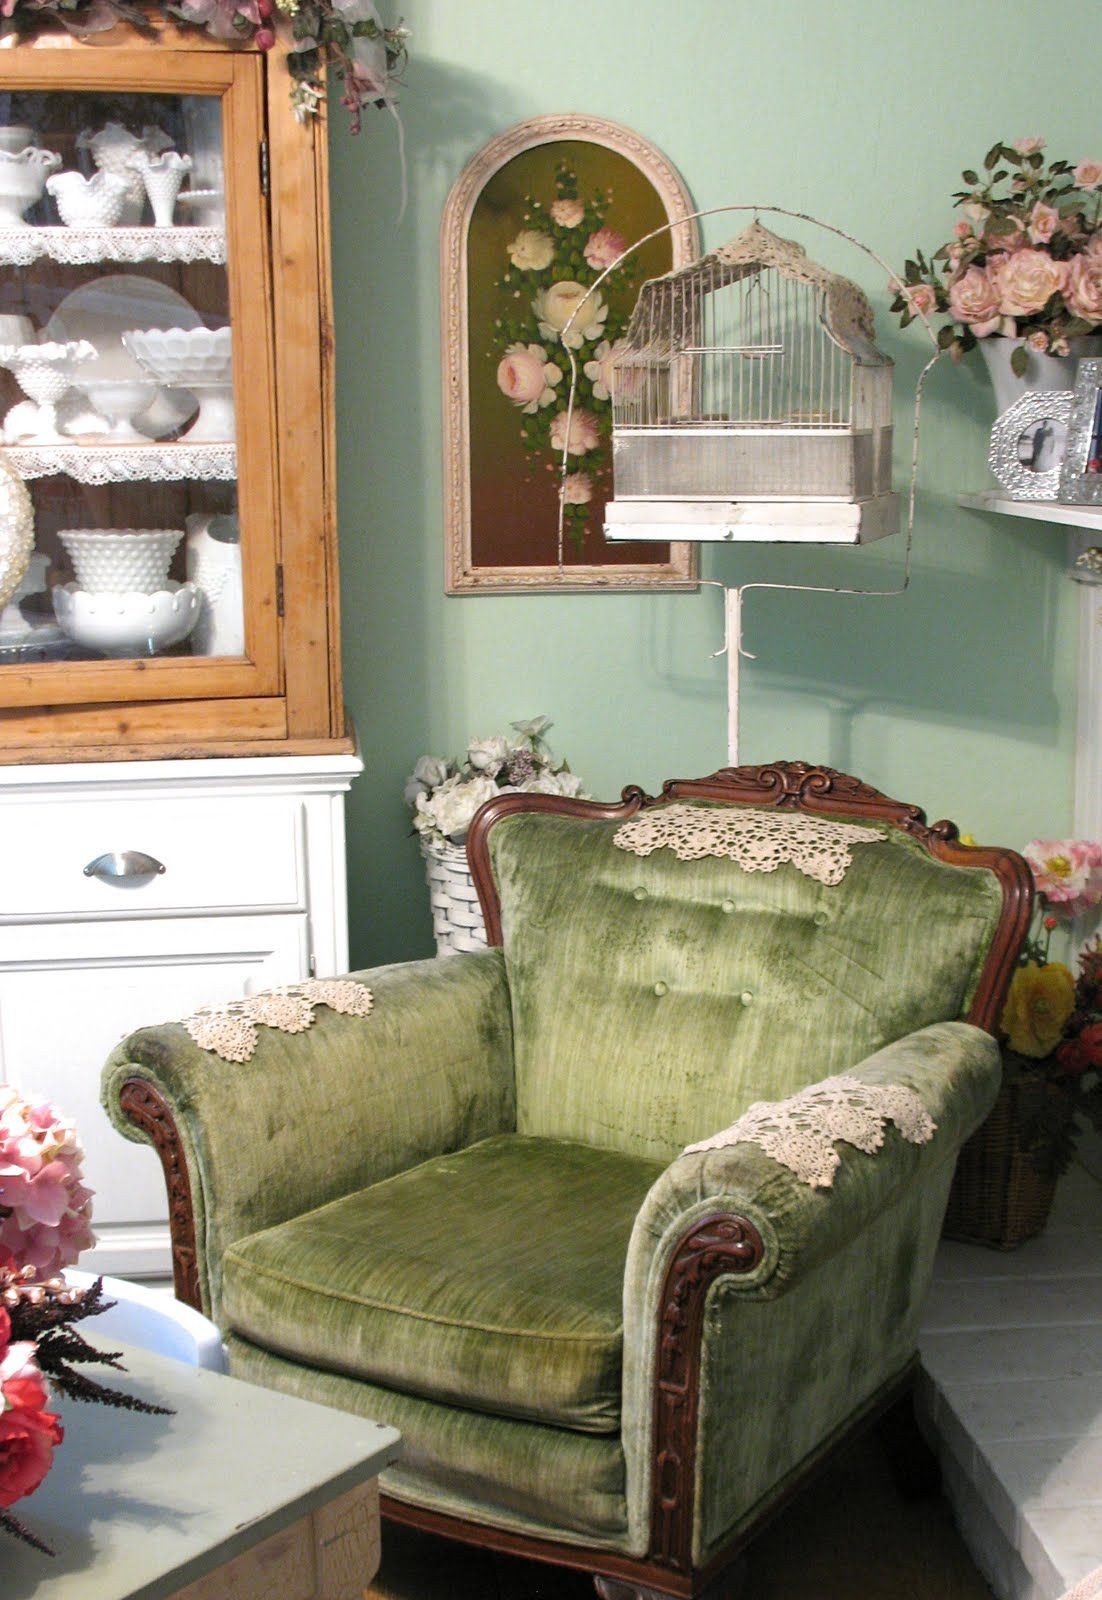 Vintage jewelry Shabby chic bedroom, Green velvet chair